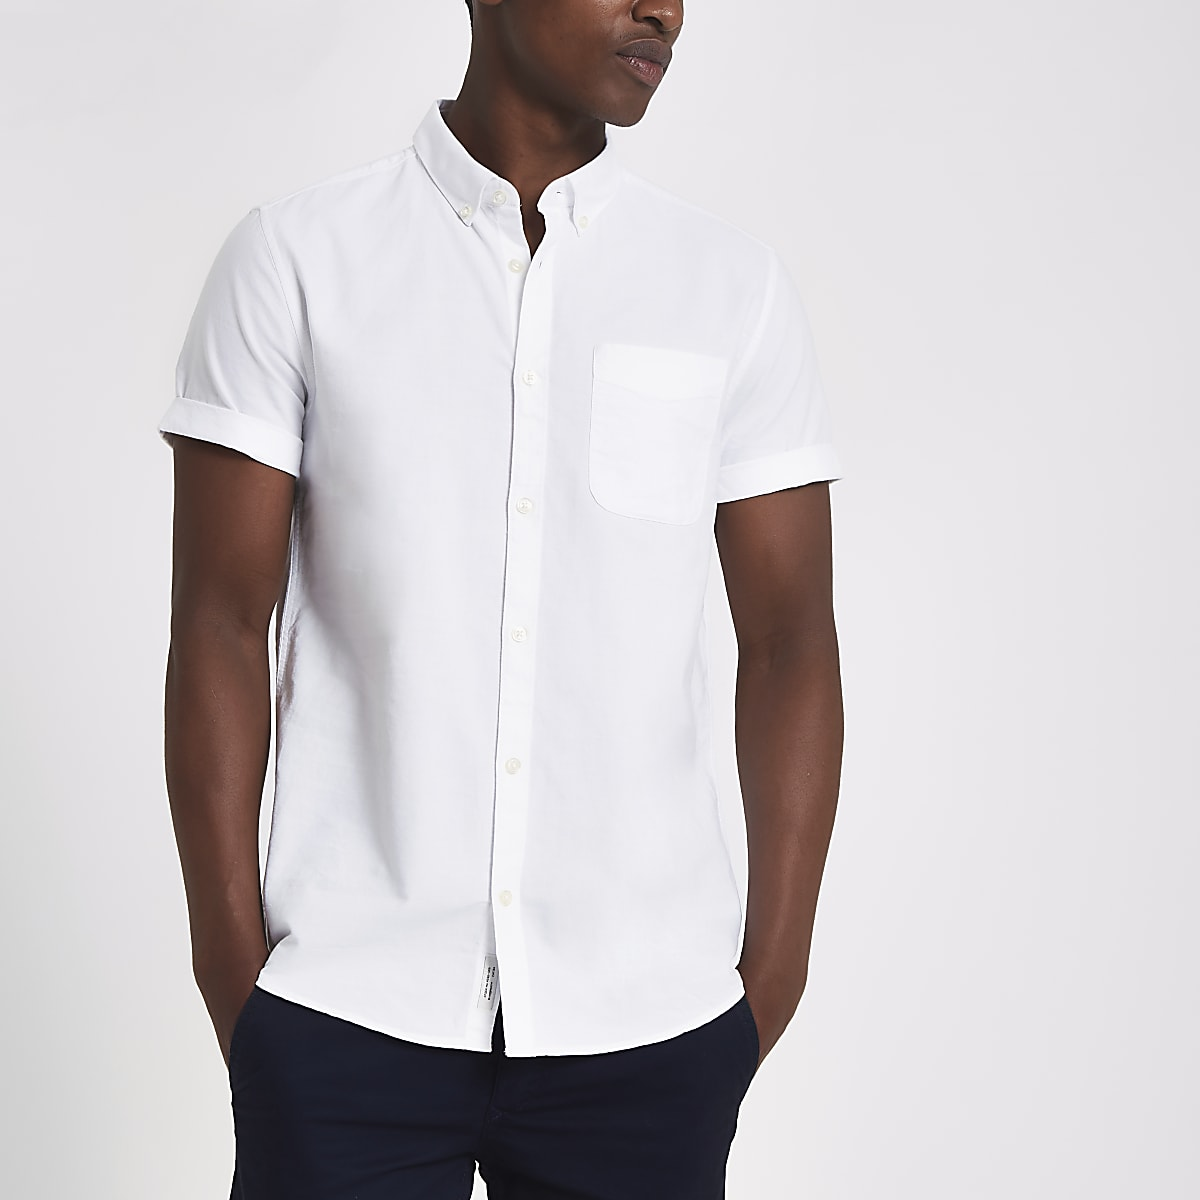 White casual short sleeve Oxford shirt